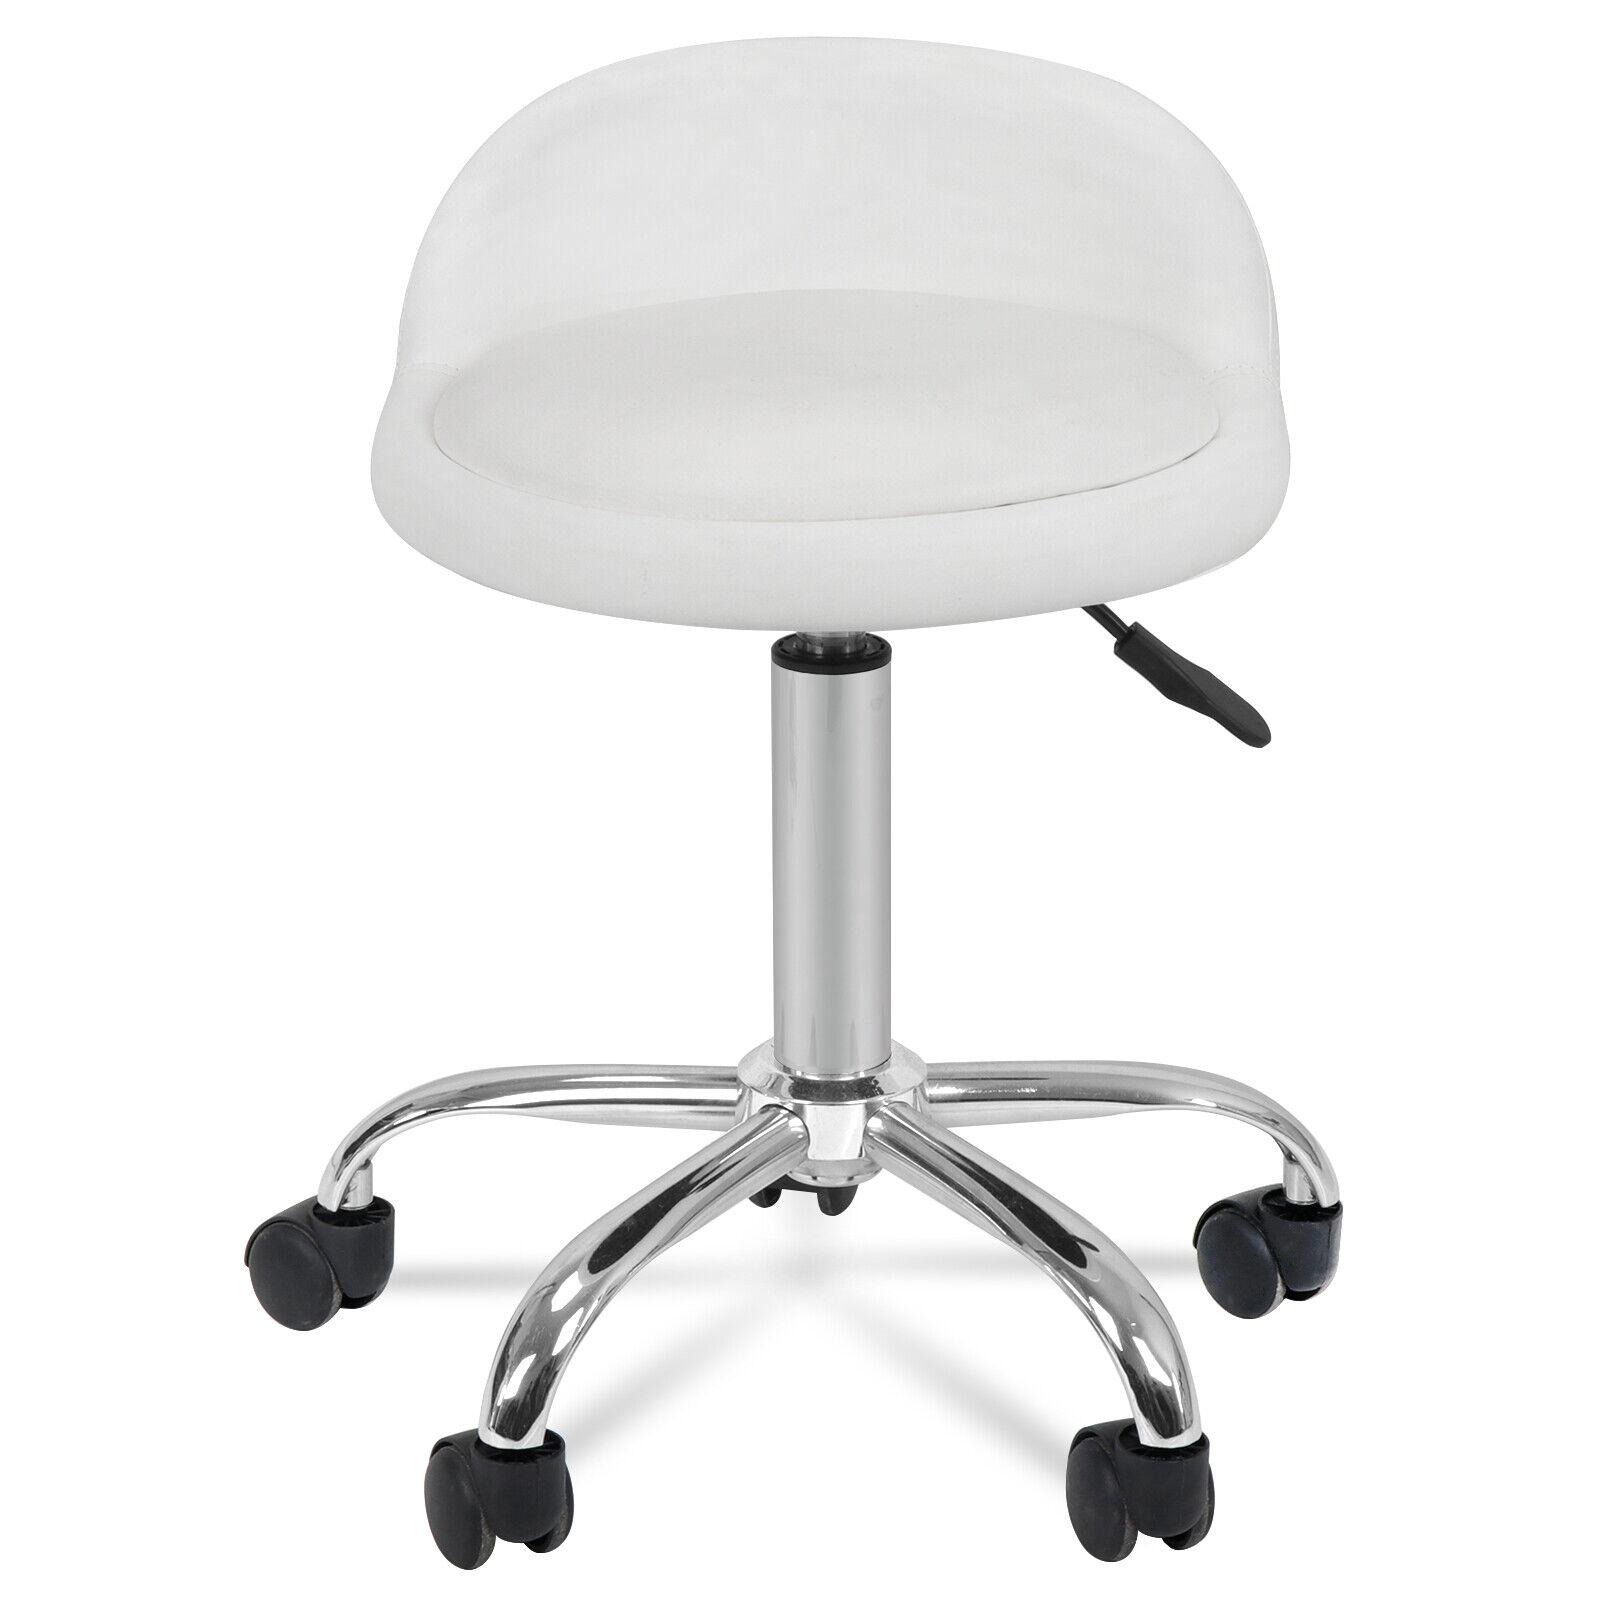 spa salon stool with back rest hydraulic